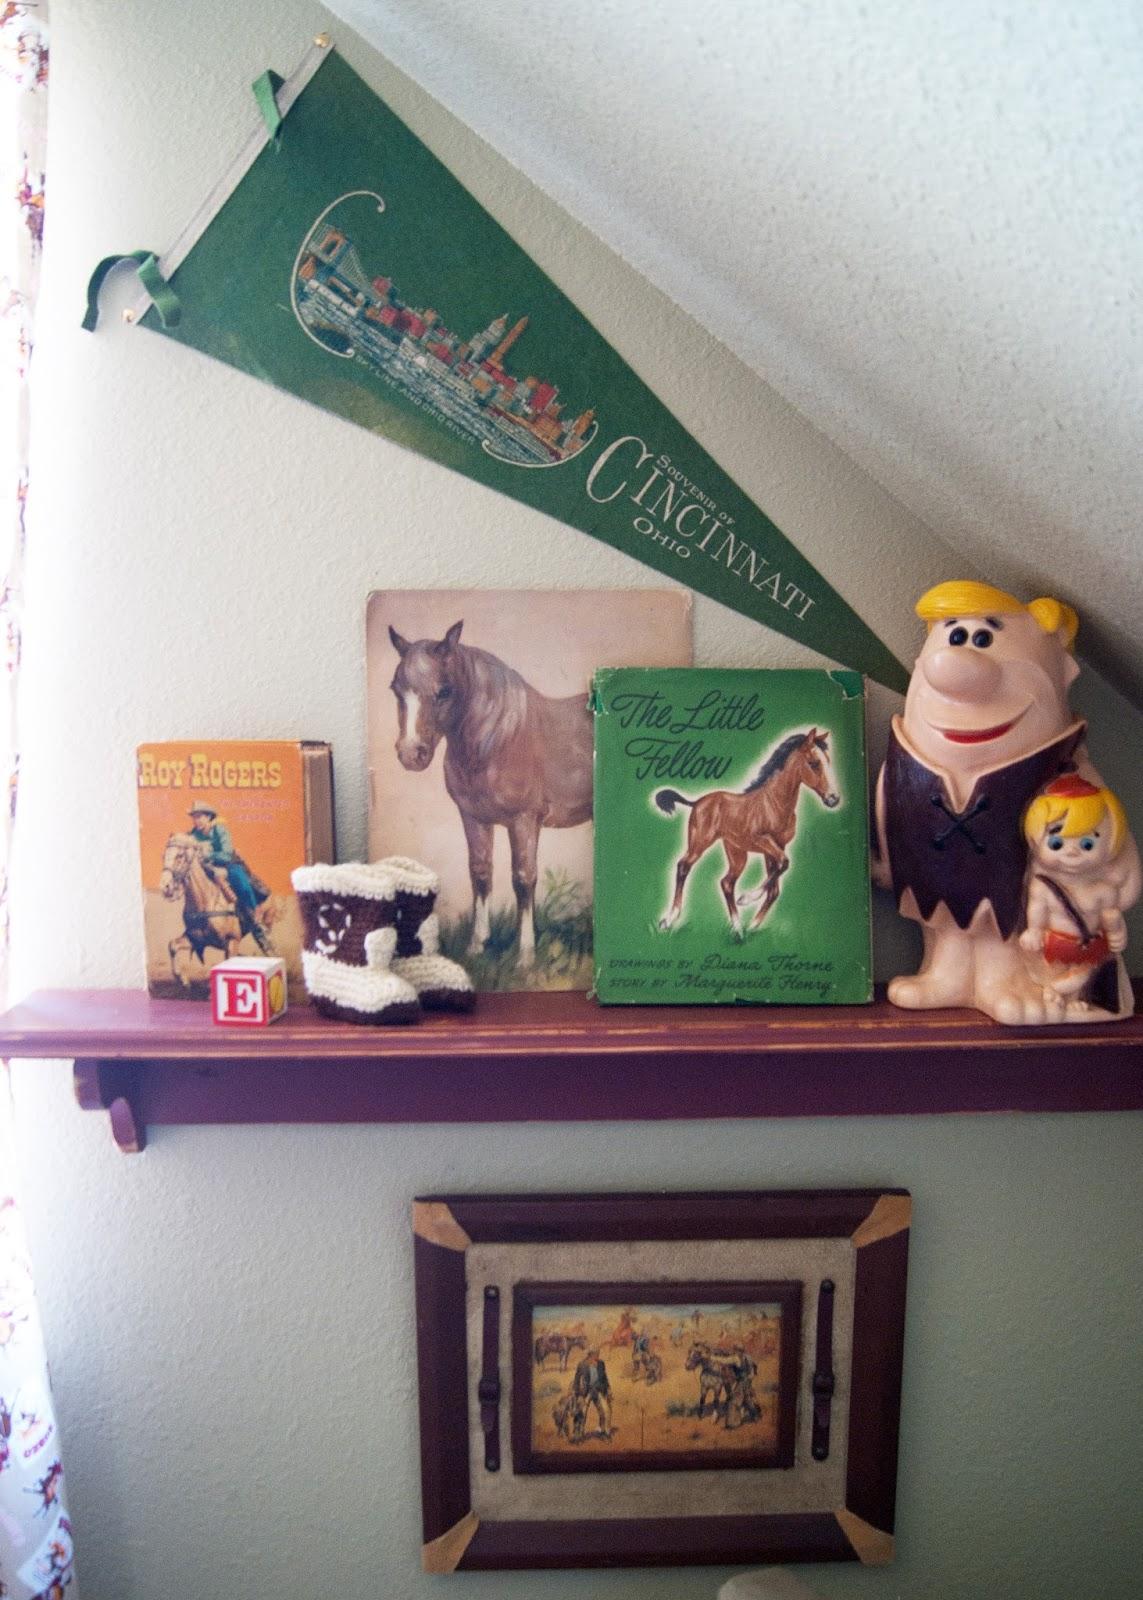 Vintage children books, crochet baby boots, letter E block, Penant and Barney Rubble piggy bank